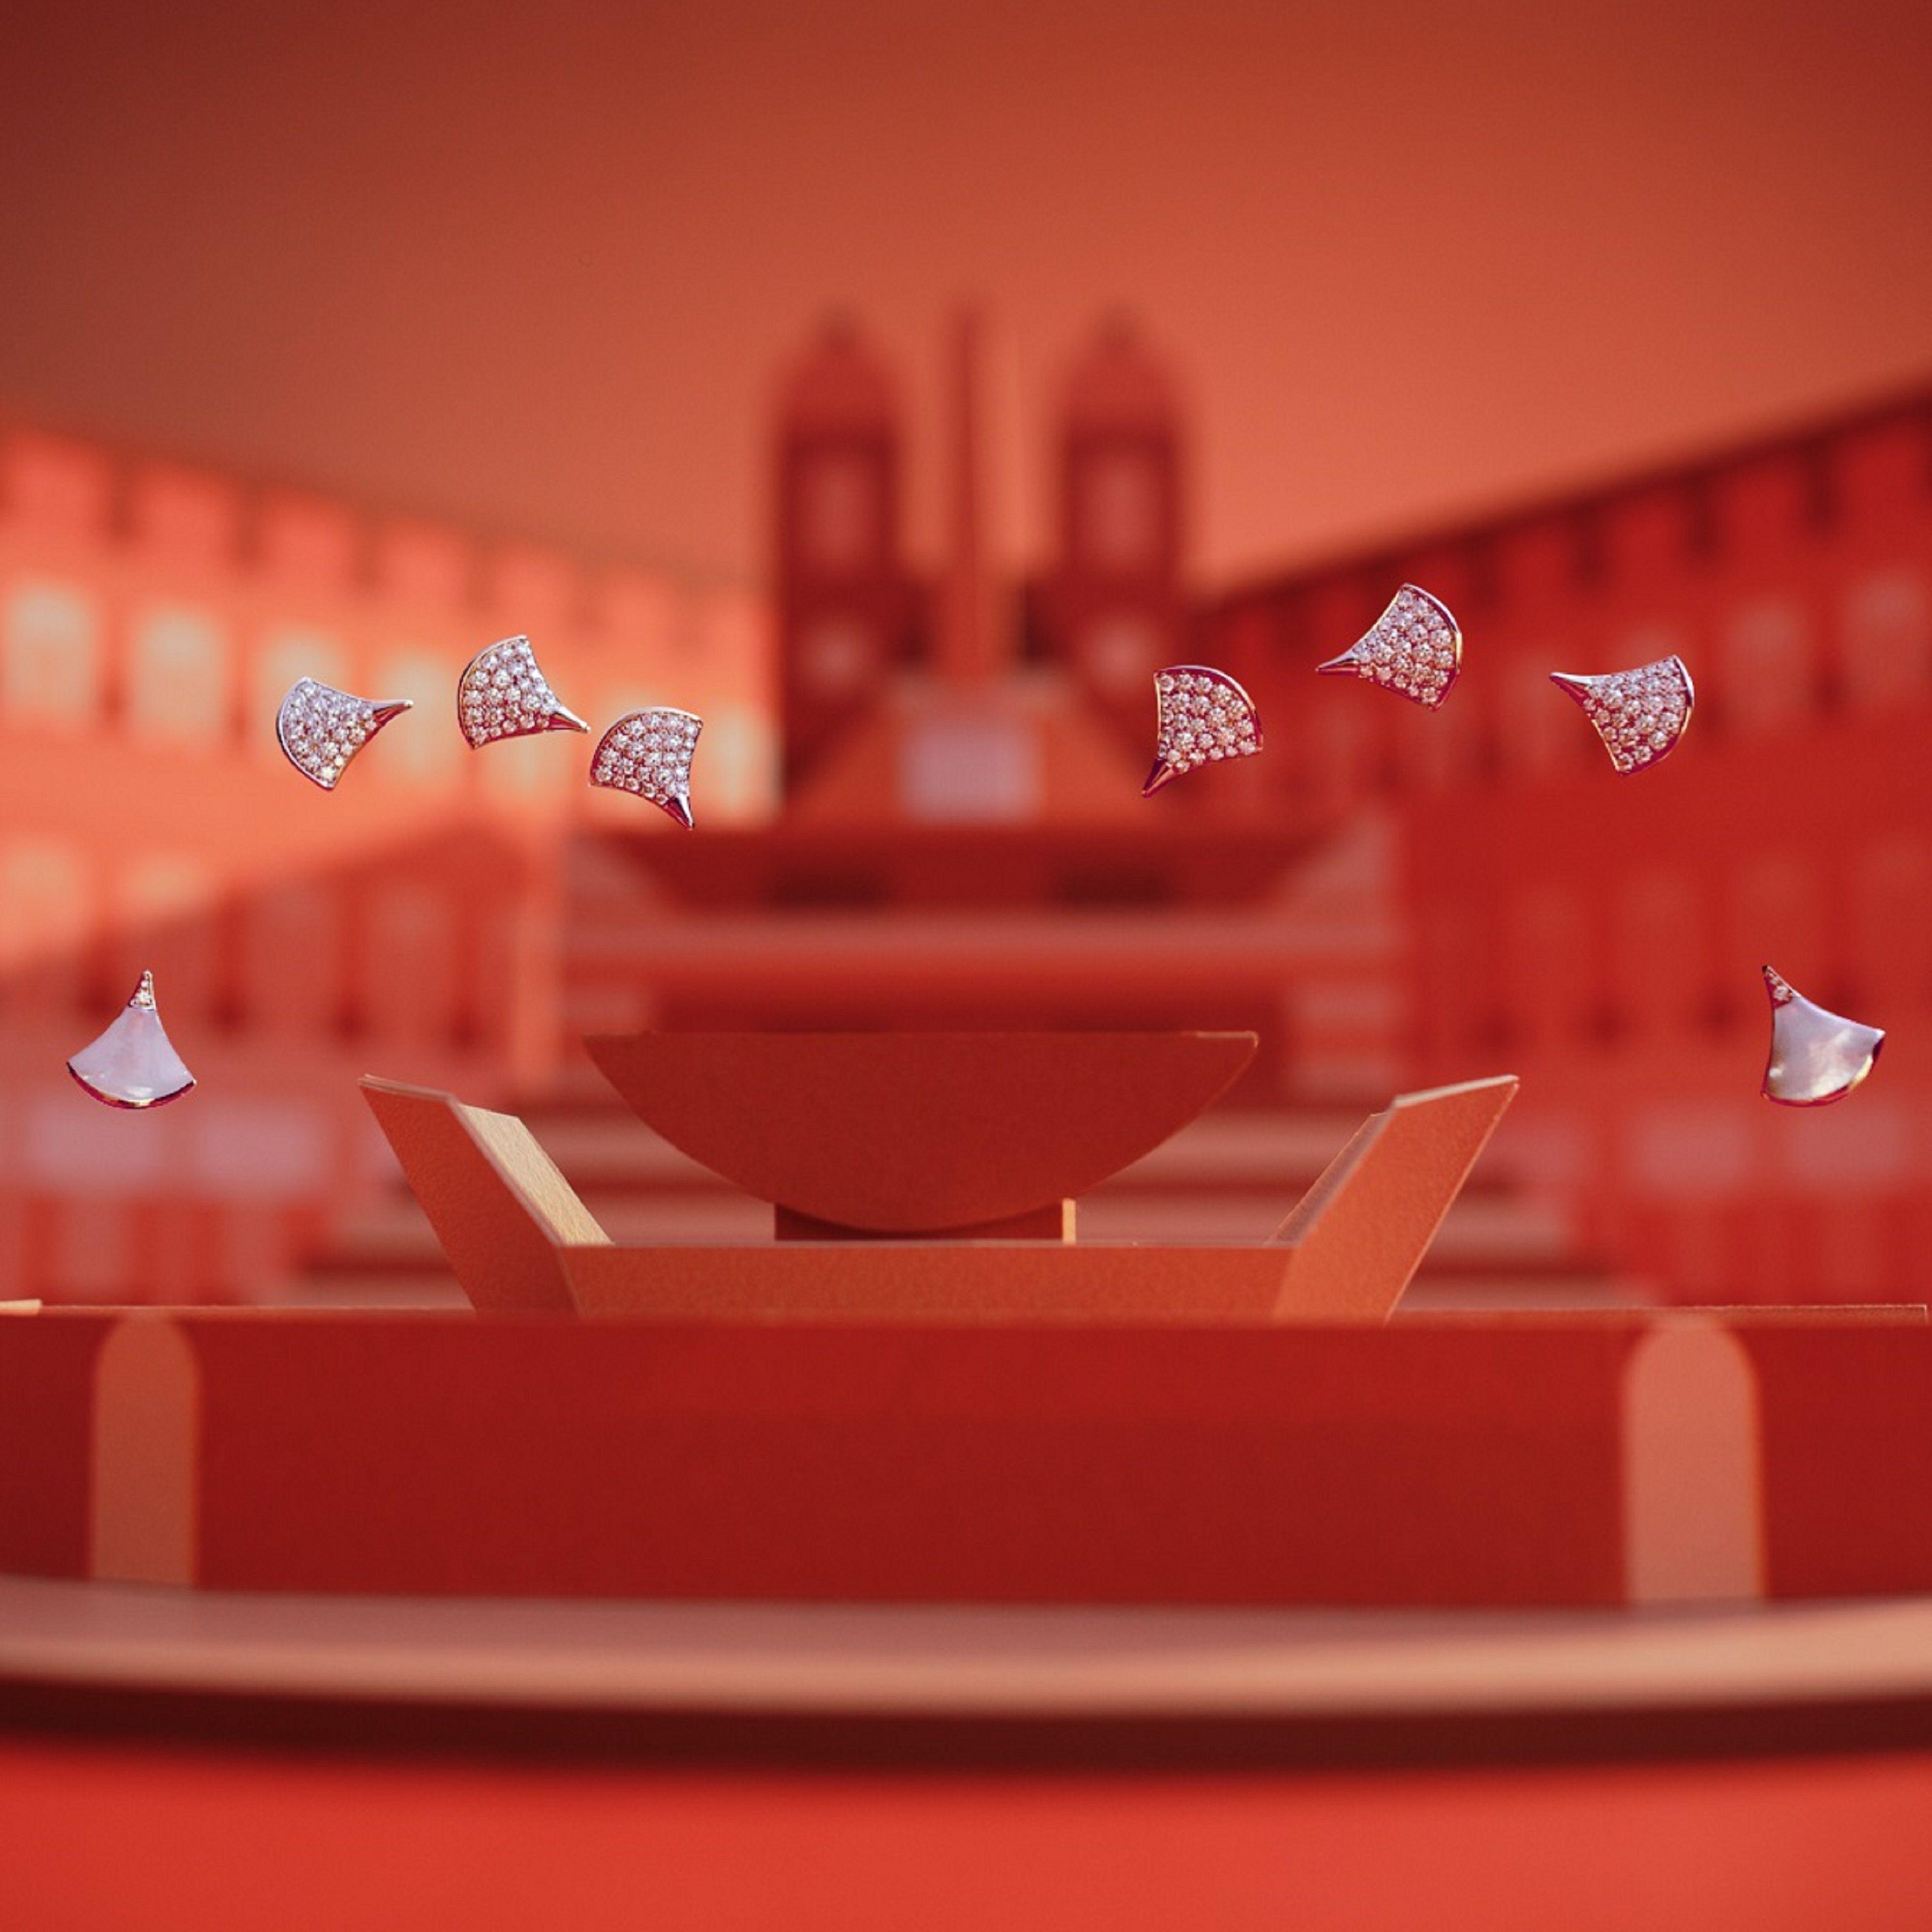 "<p>而由義大利知名導演兼影片製作人Virgilio Villoresi特別為寶格麗製作的羅馬假期廣告影片,則以趣味橫生的手法,散播珠寶的華麗精神,申明BVLGARI享樂主義至上,活在當下的生活態度。在特定活動日,BVLGARI店面也將提供LVMH集團旗下米蘭百年甜點老店COVA的傳統義式冰淇淋,傳遞最正統的義式風味。<span class=""redactor-invisible-space""></span></p>"